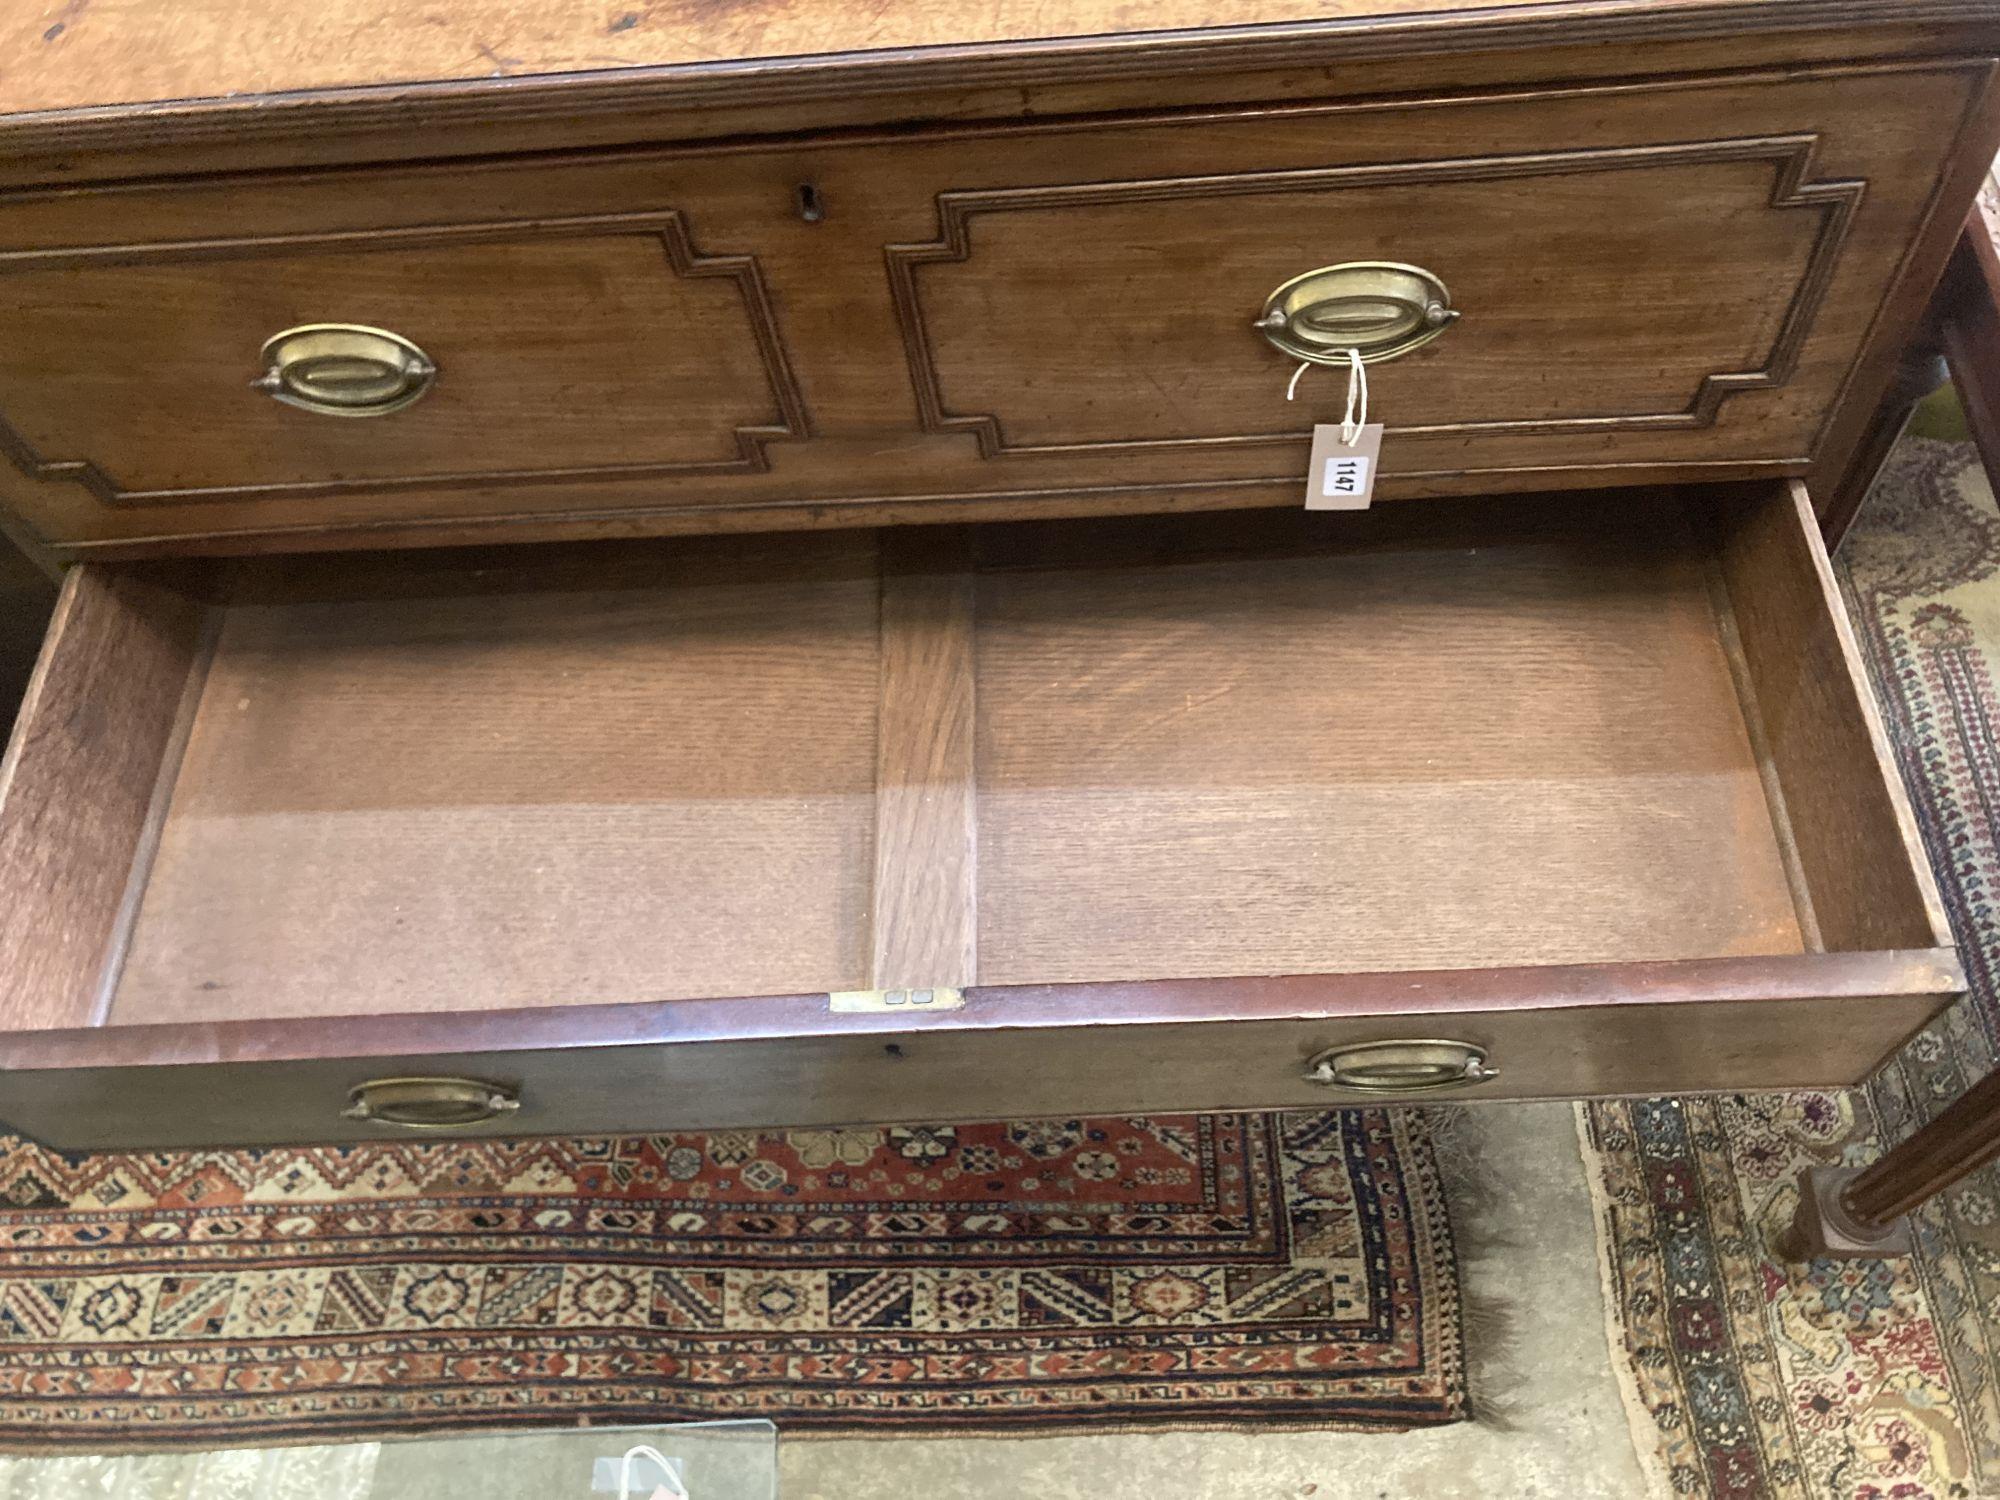 A Regency mahogany secretaire chest, width 106cm depth 55cm height 106cm - Image 4 of 4